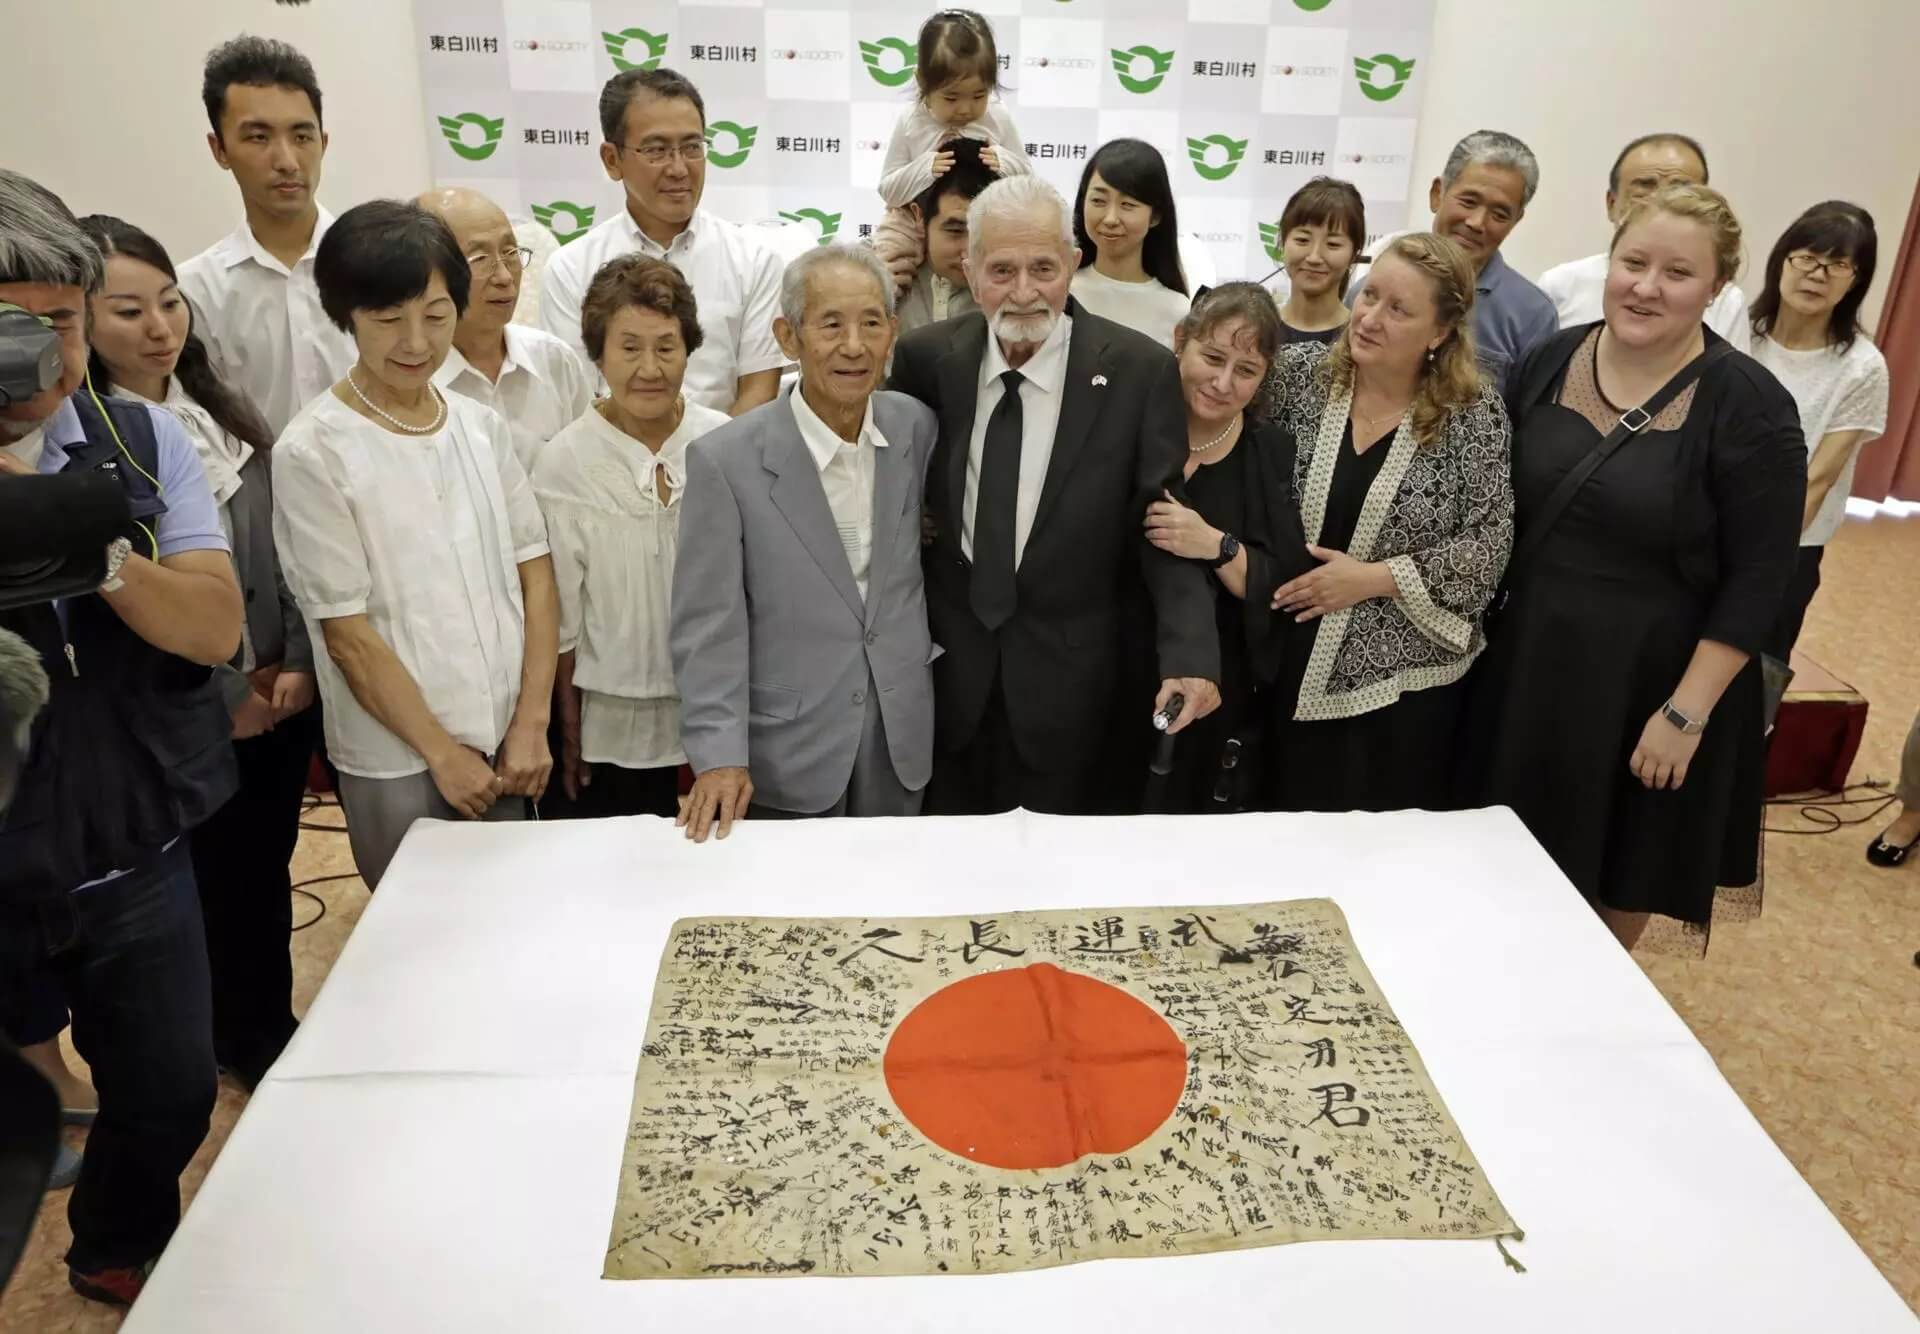 ww2_veteran_returns_japan_flag_to_dead_soldier_fam (1) (1)